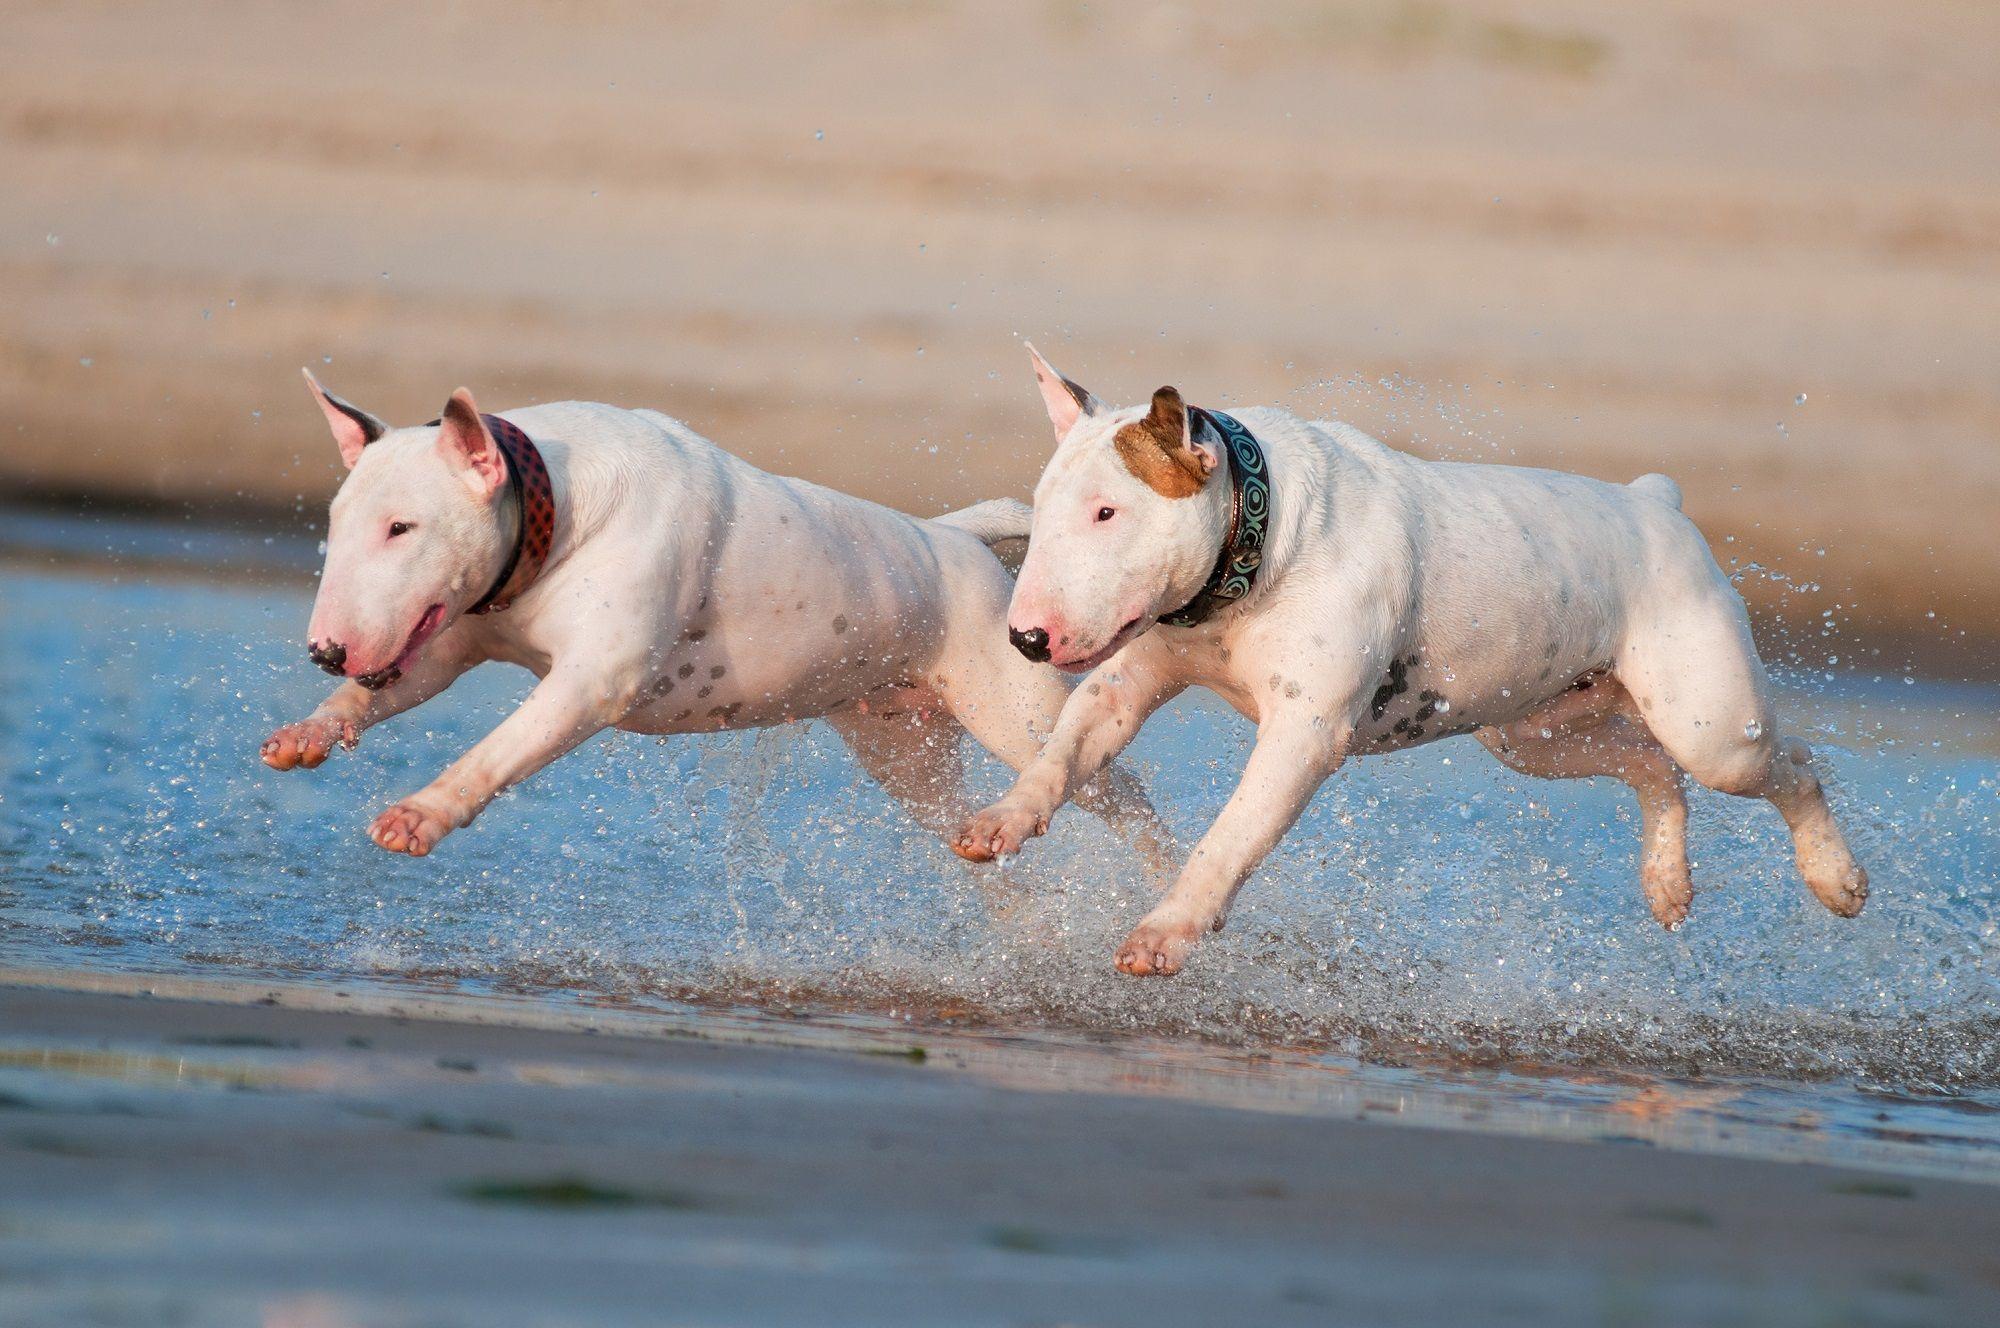 10. English Bull Terrier